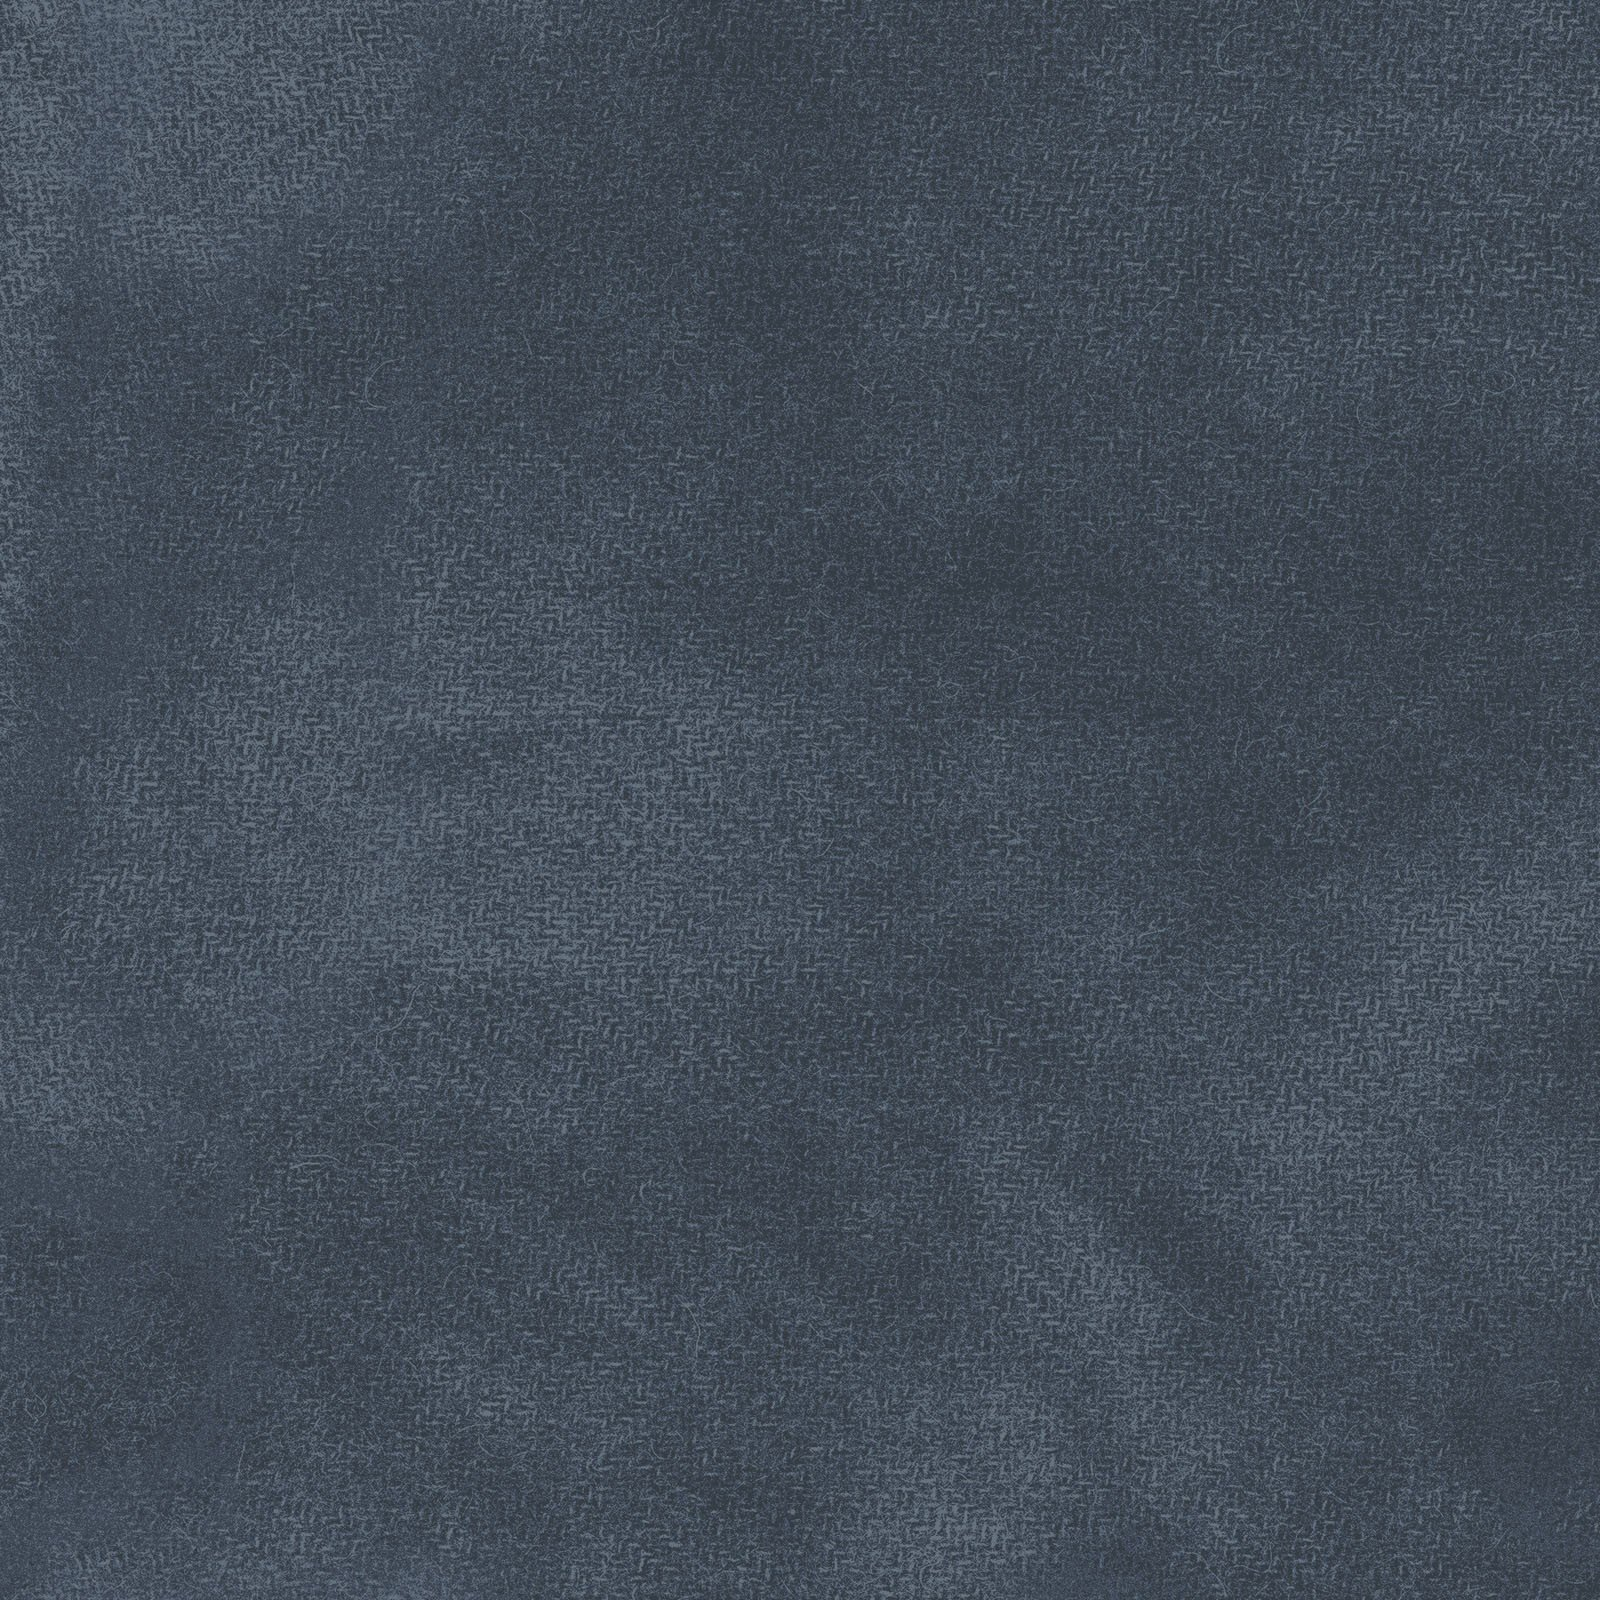 Woolies Flannel - Deep Sea Blue<br/>Maywood Studio F9200-B